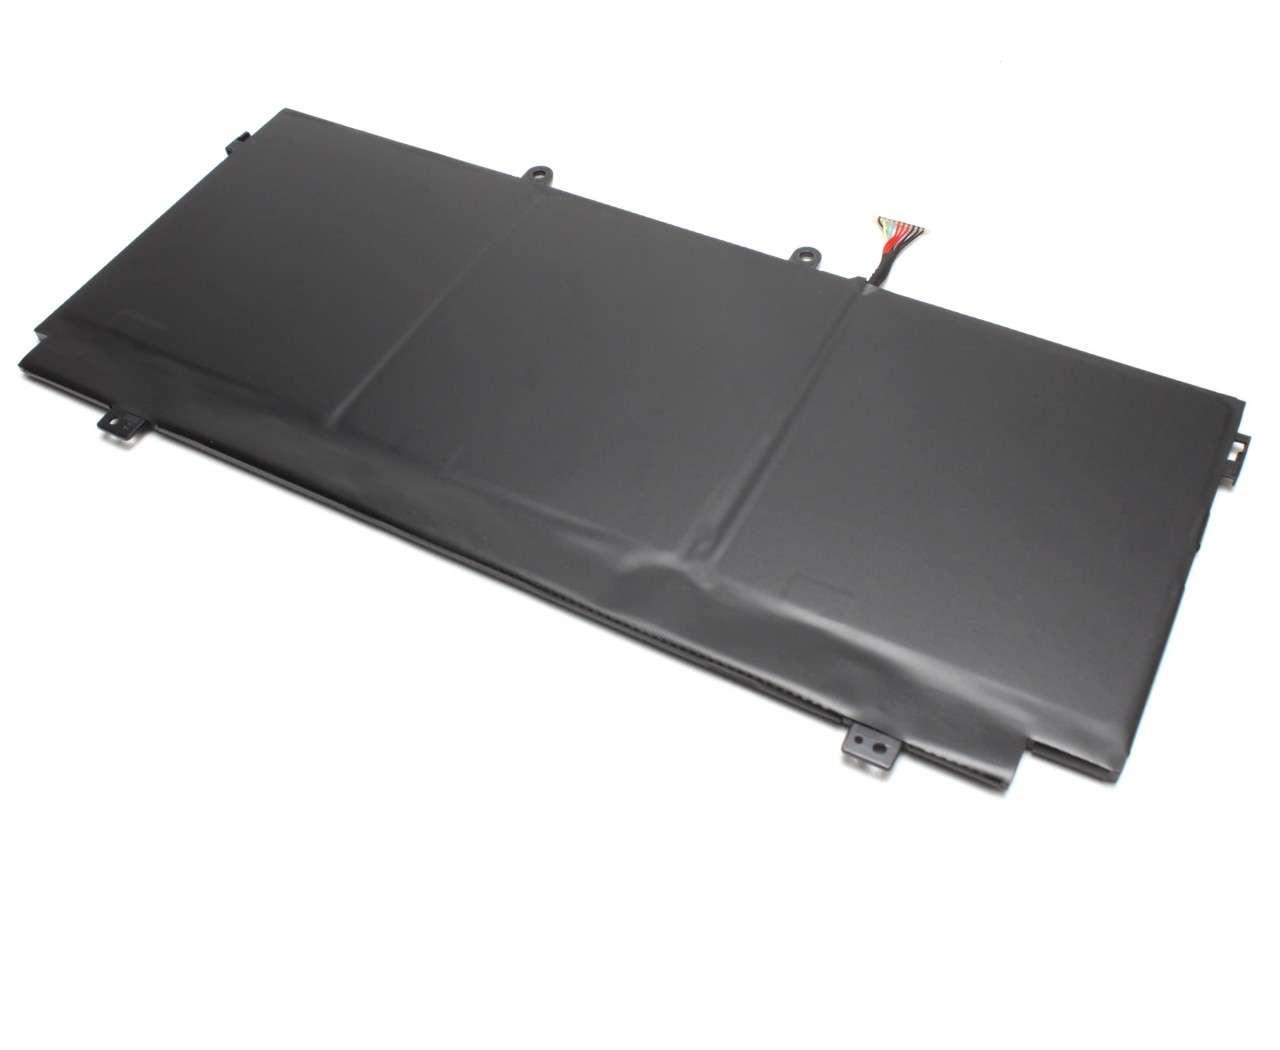 Baterie HP Envy 13-AB011TU Originala 57.9Wh imagine